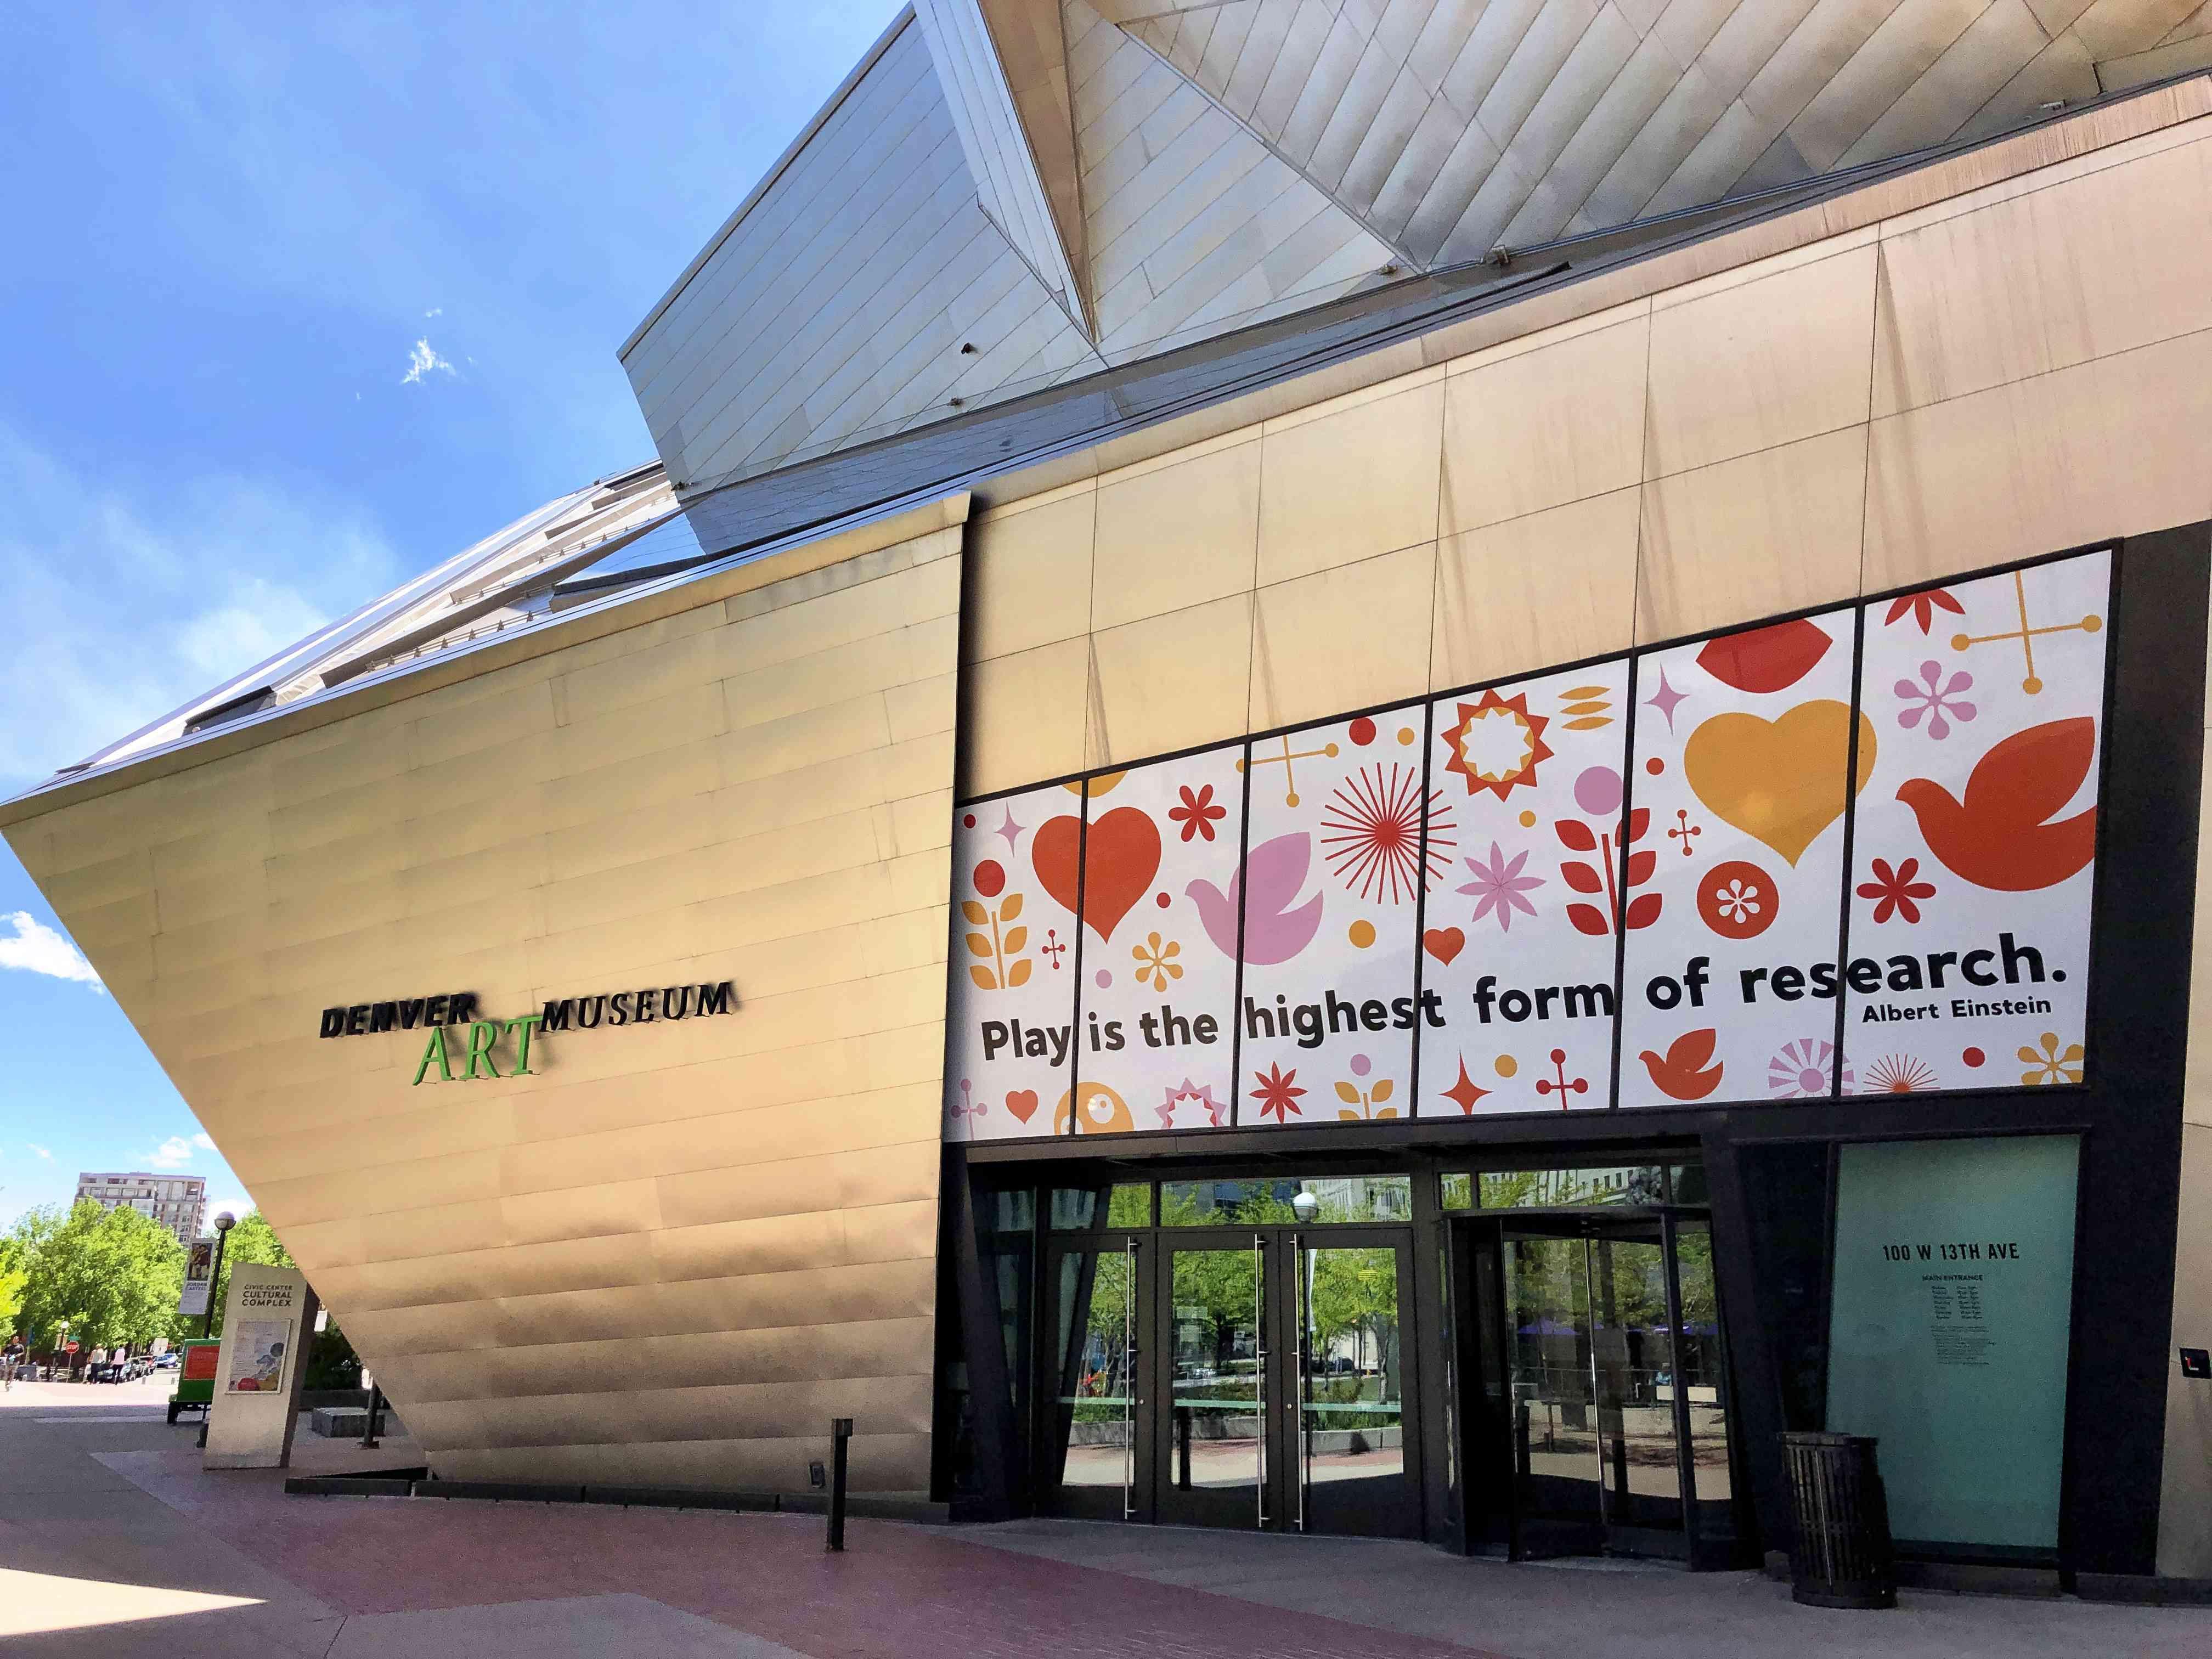 Entrance to the Denver Art Museum